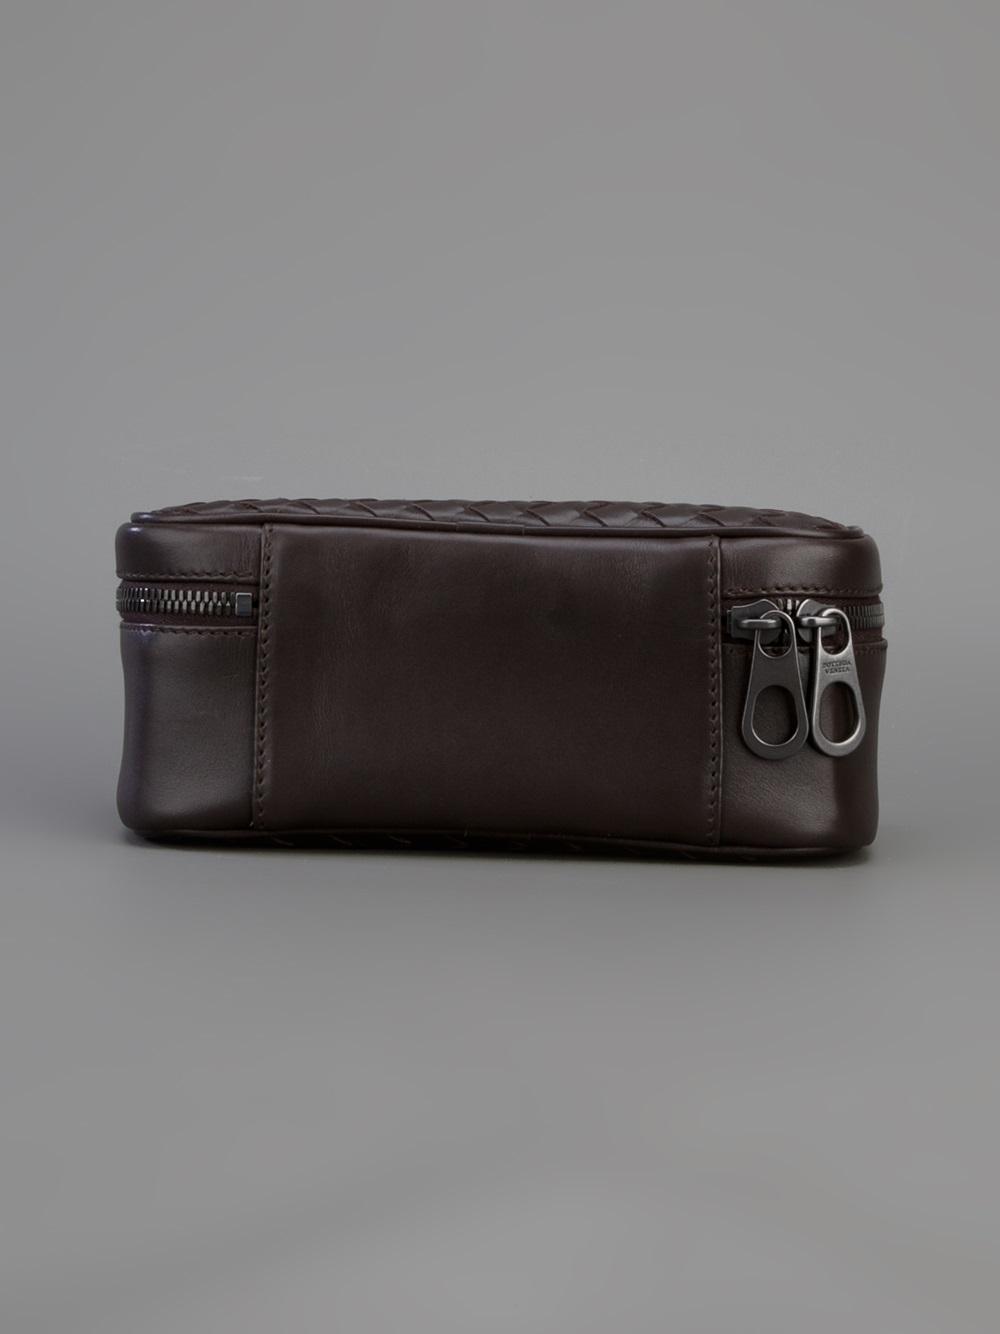 Bottega veneta Watches Travel Case in Black | Lyst